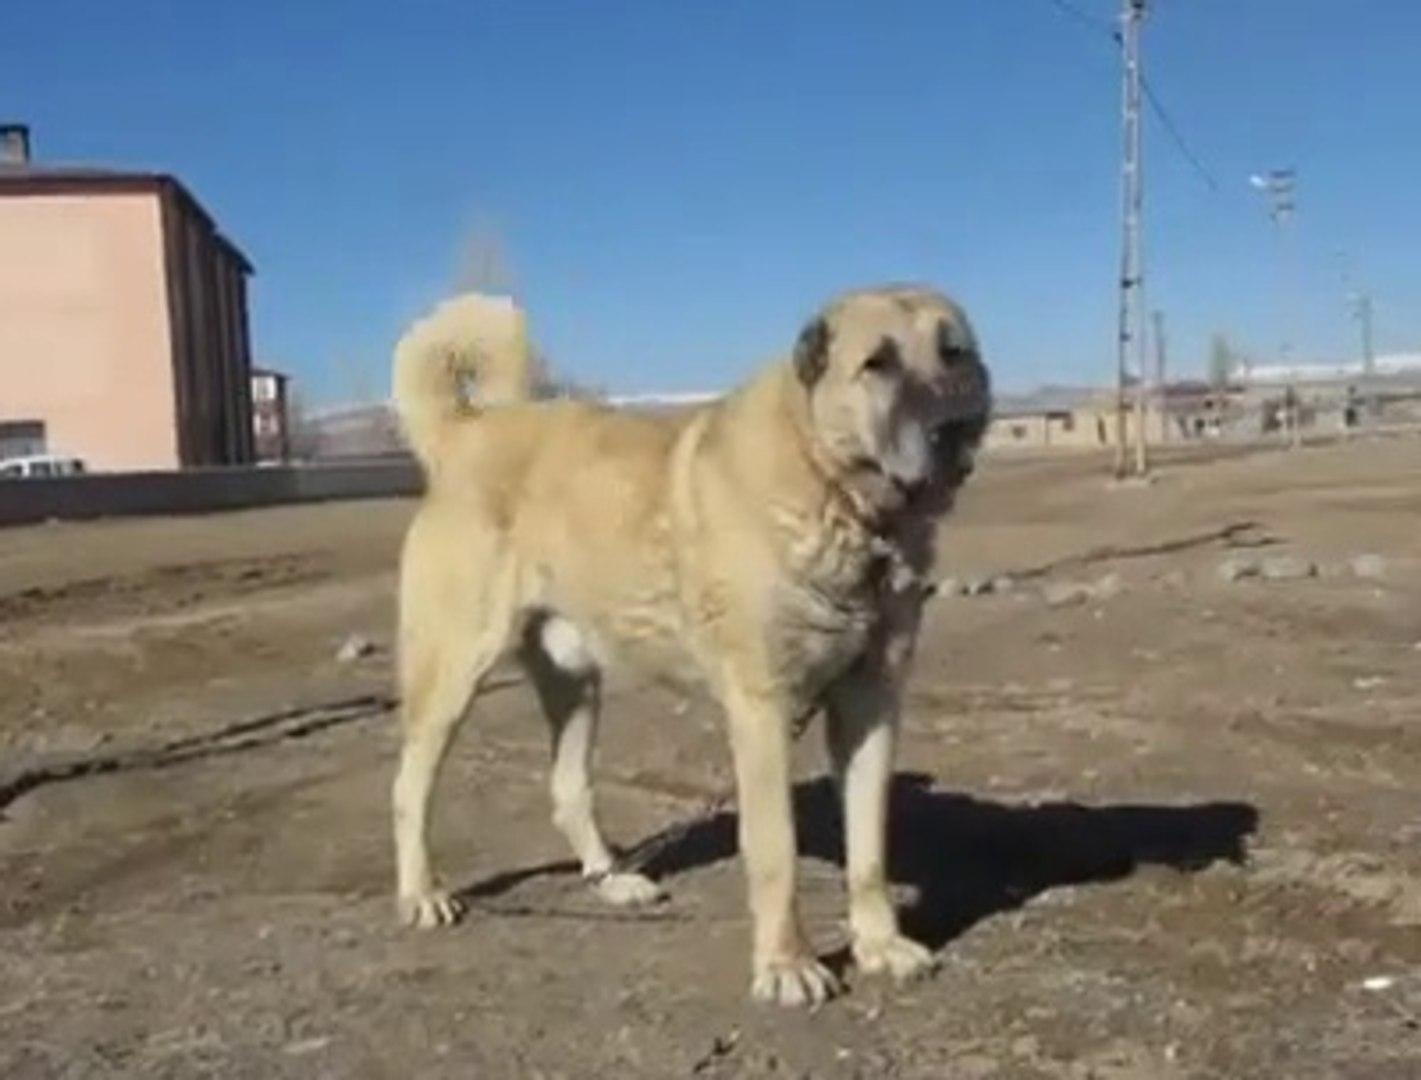 SERBULENT USTADIN KESFETTiGi KANGAL KOPEGi - QUALiTY KANGAL SHEPHERD DOG